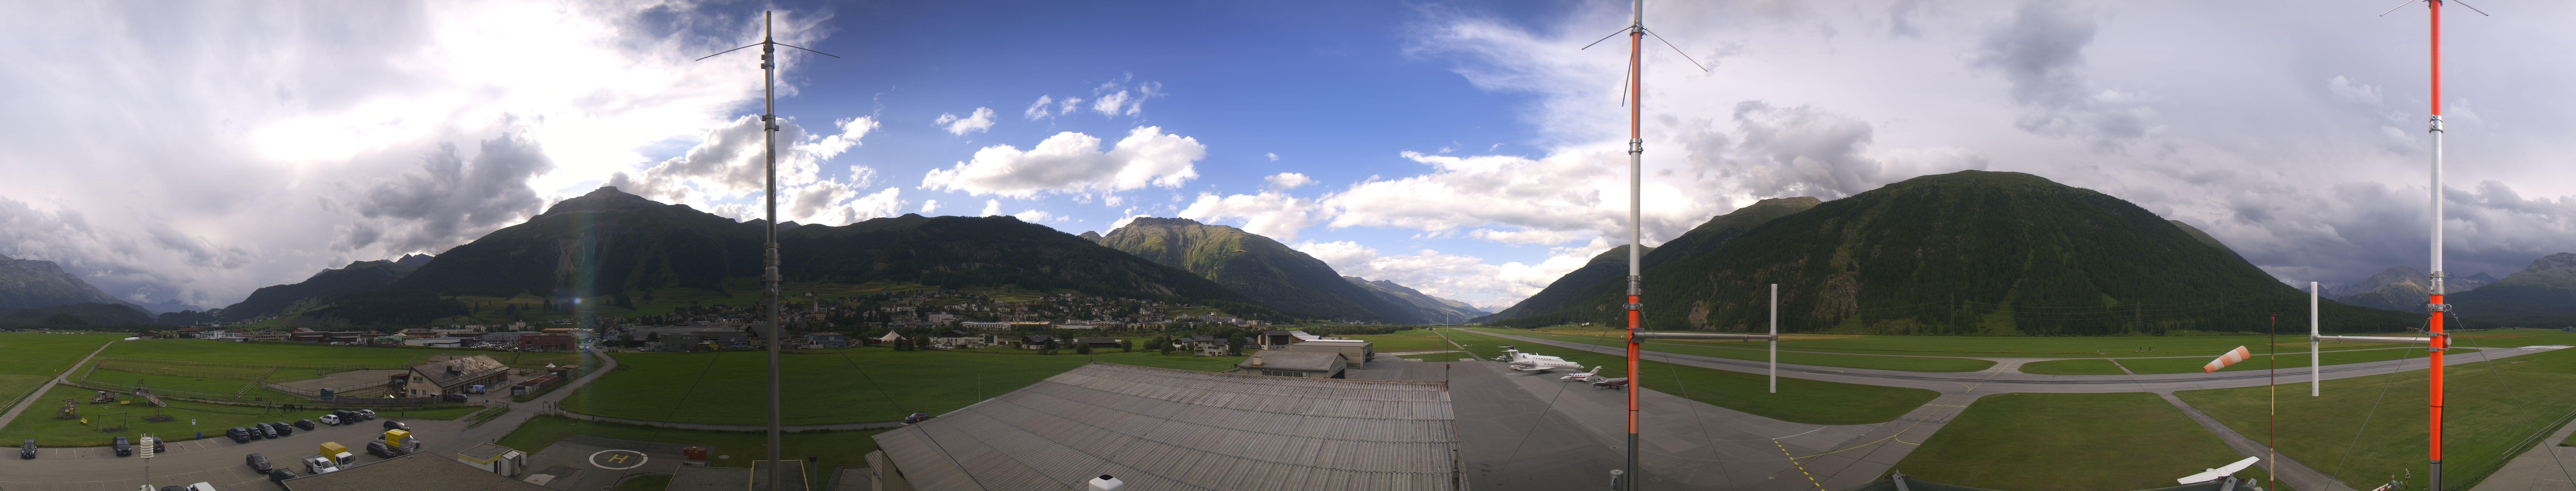 Samedan: Airport - Chantun Grischun, Szwajcaria